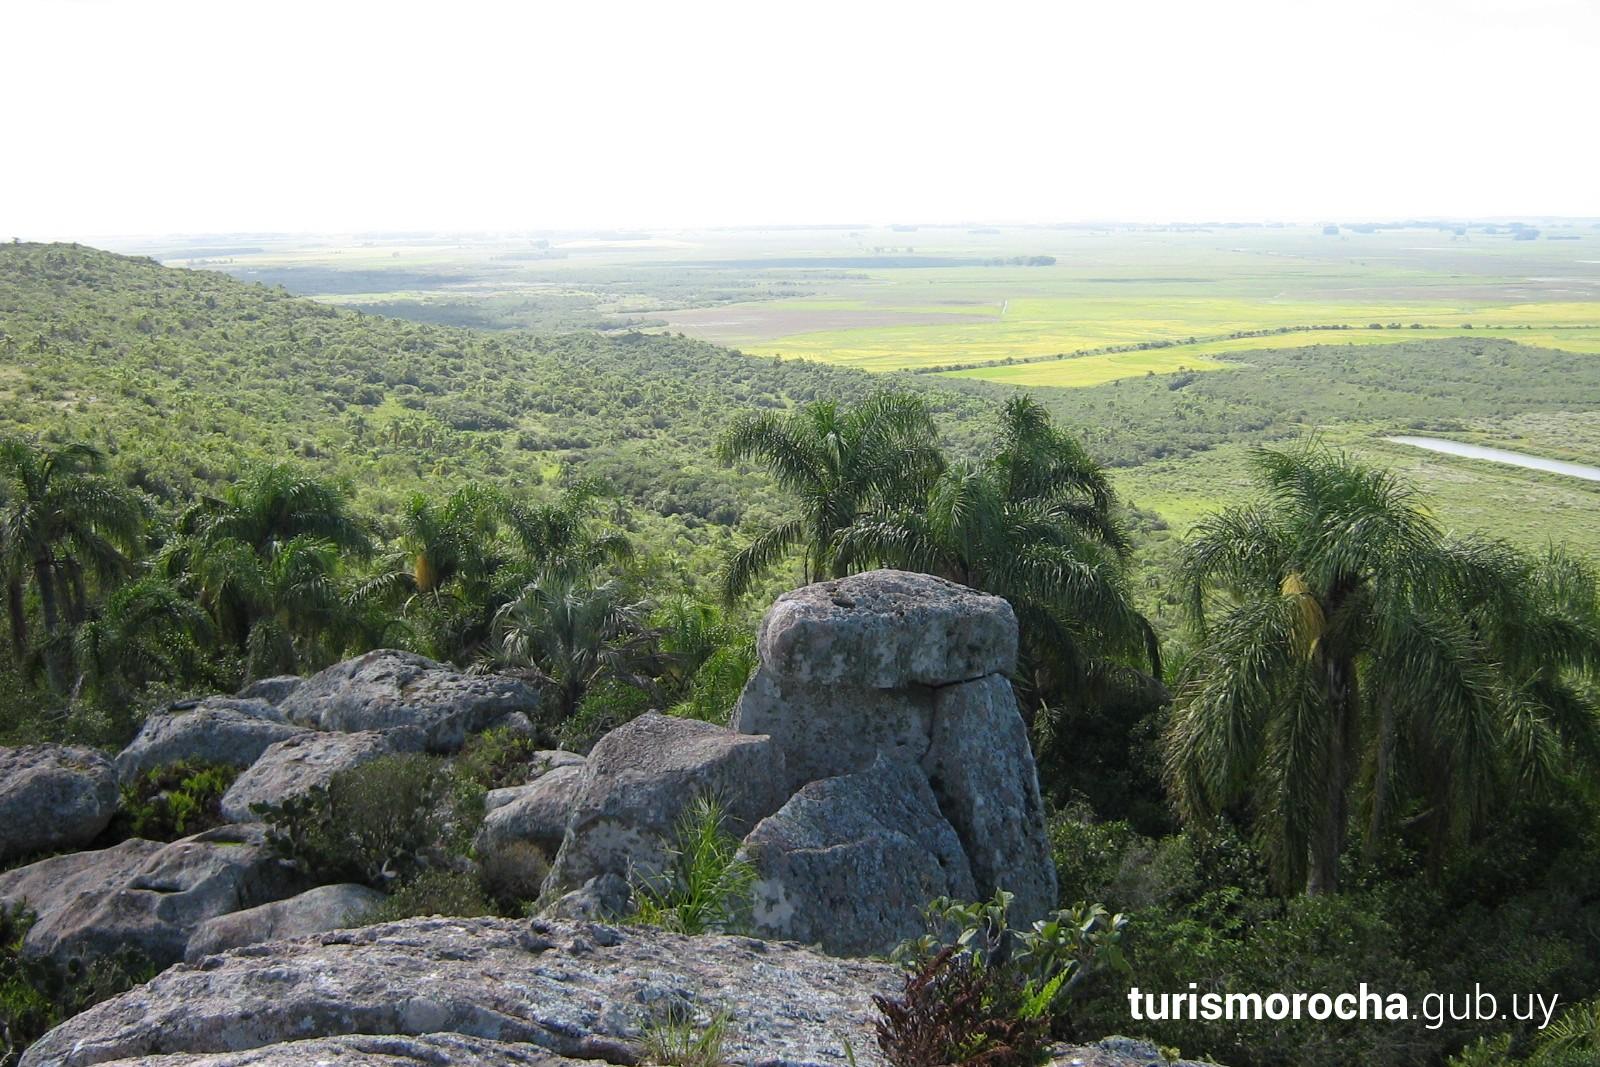 Vista desde la cima del Cerro Picudo